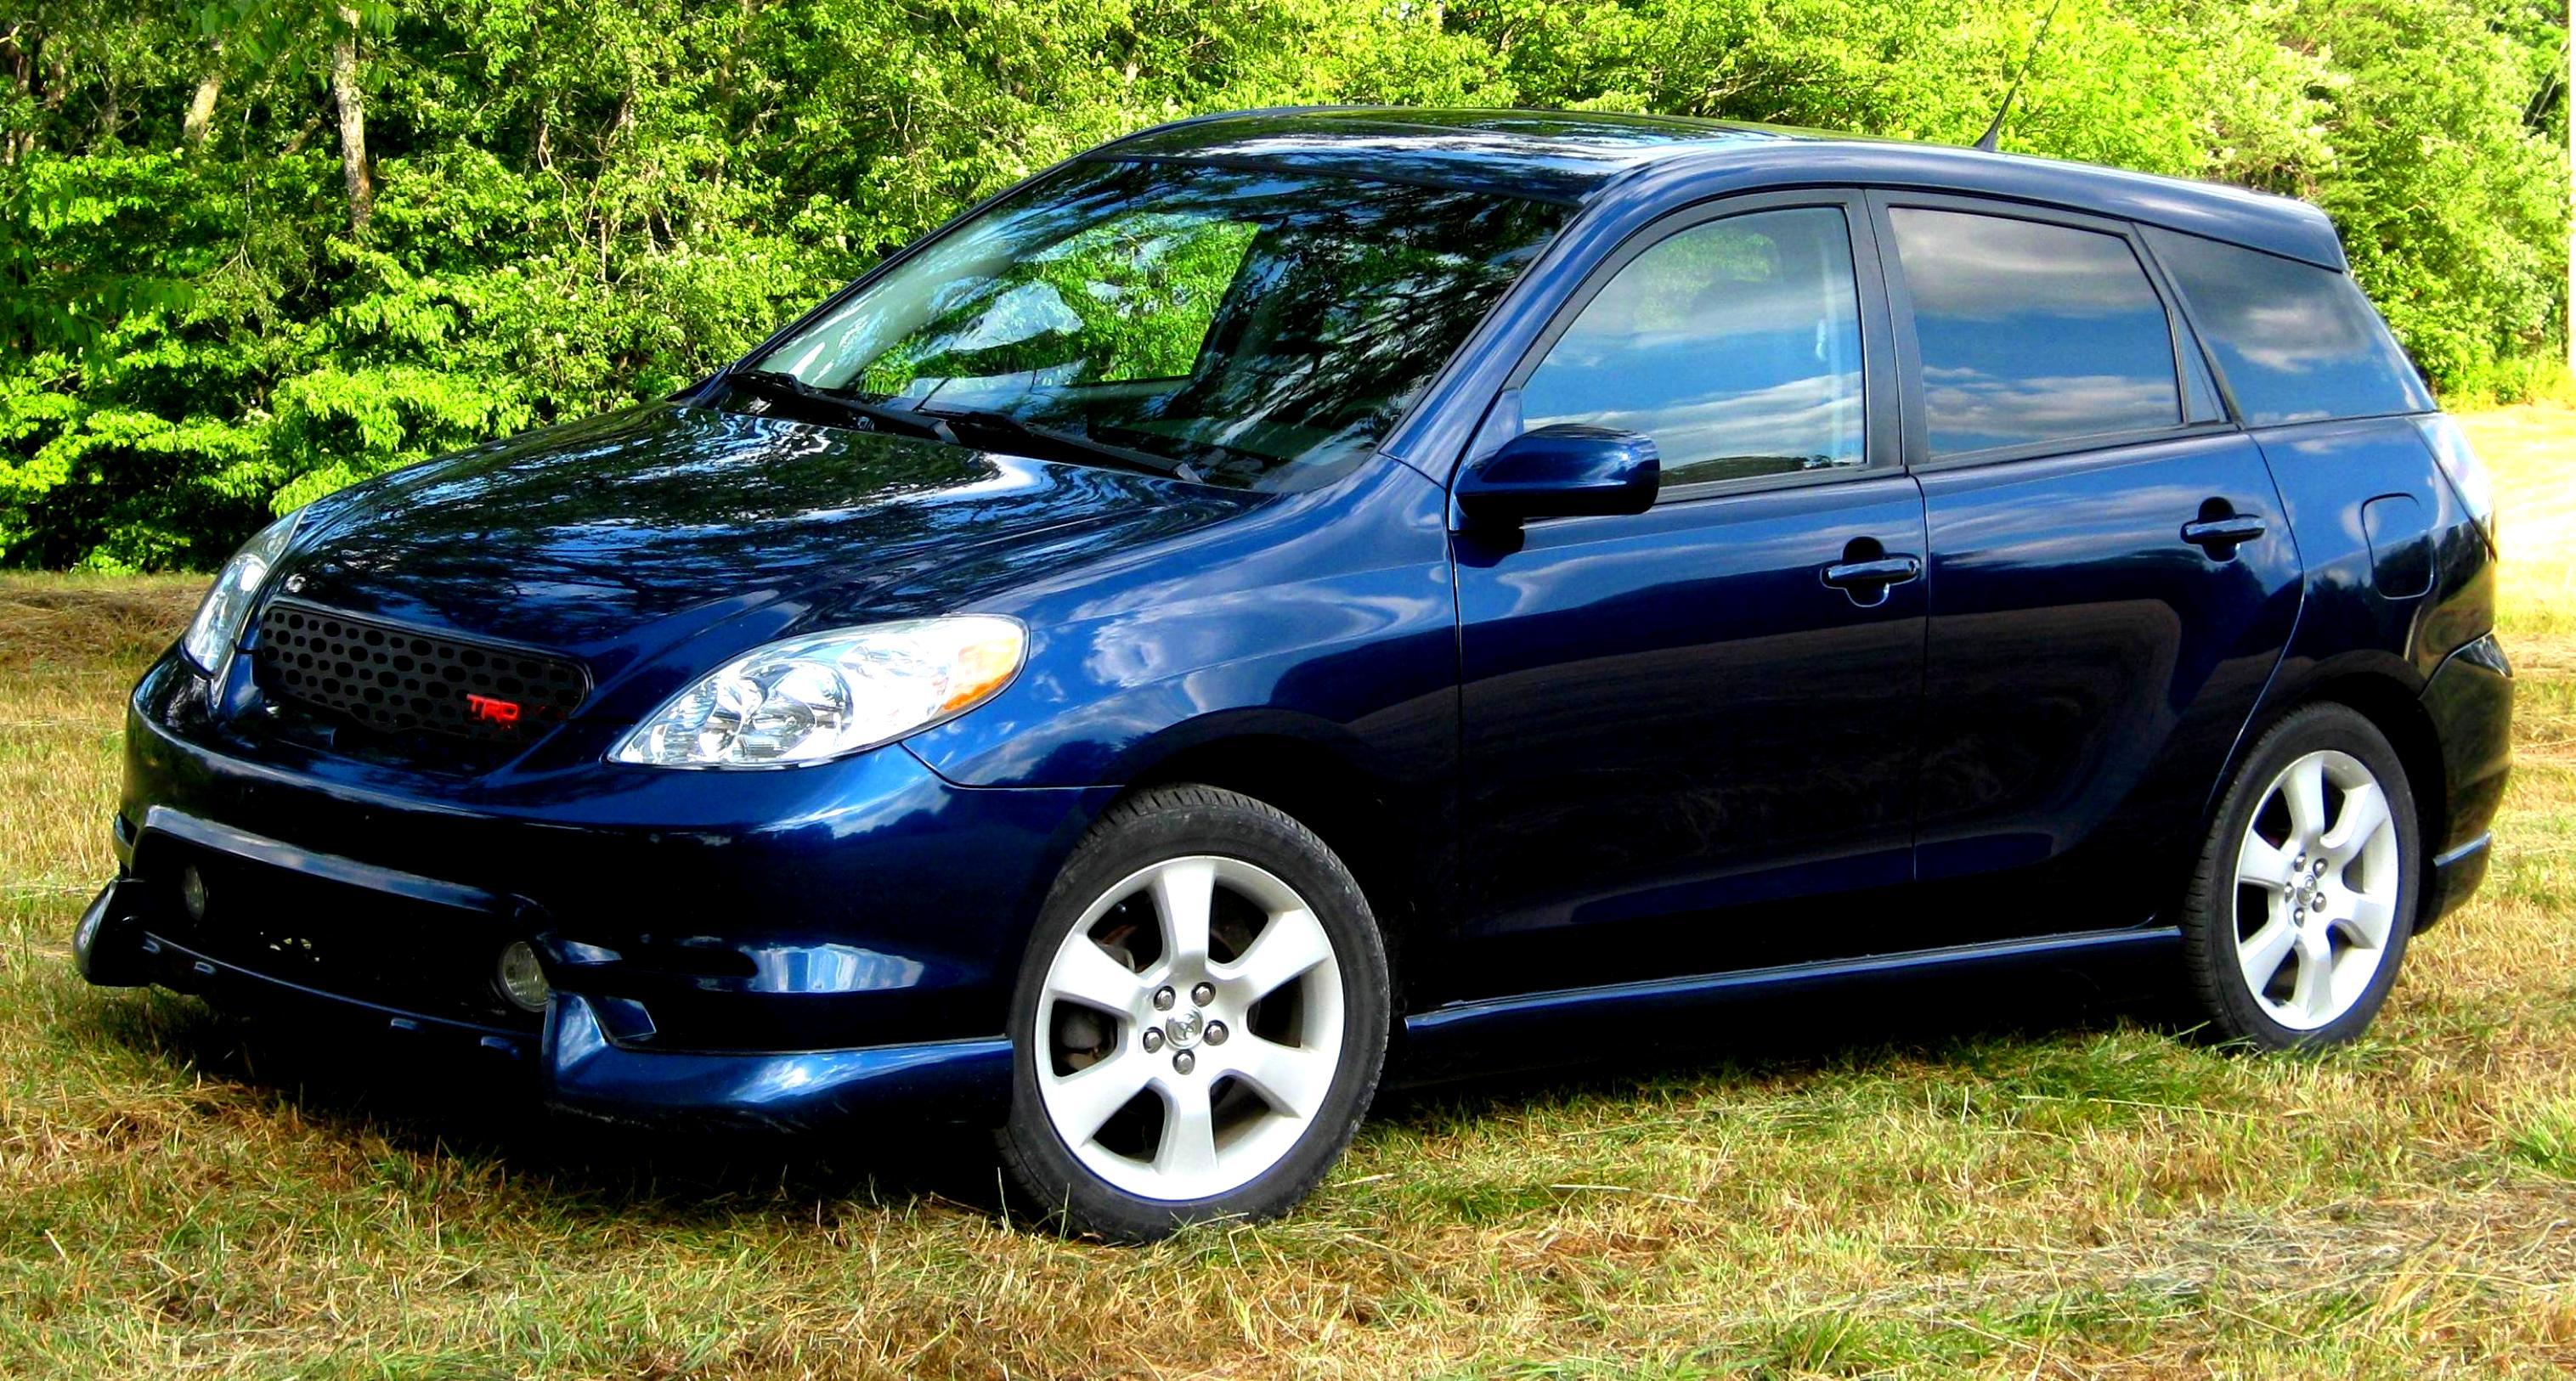 Toyota Matrix 2003 #2 ...